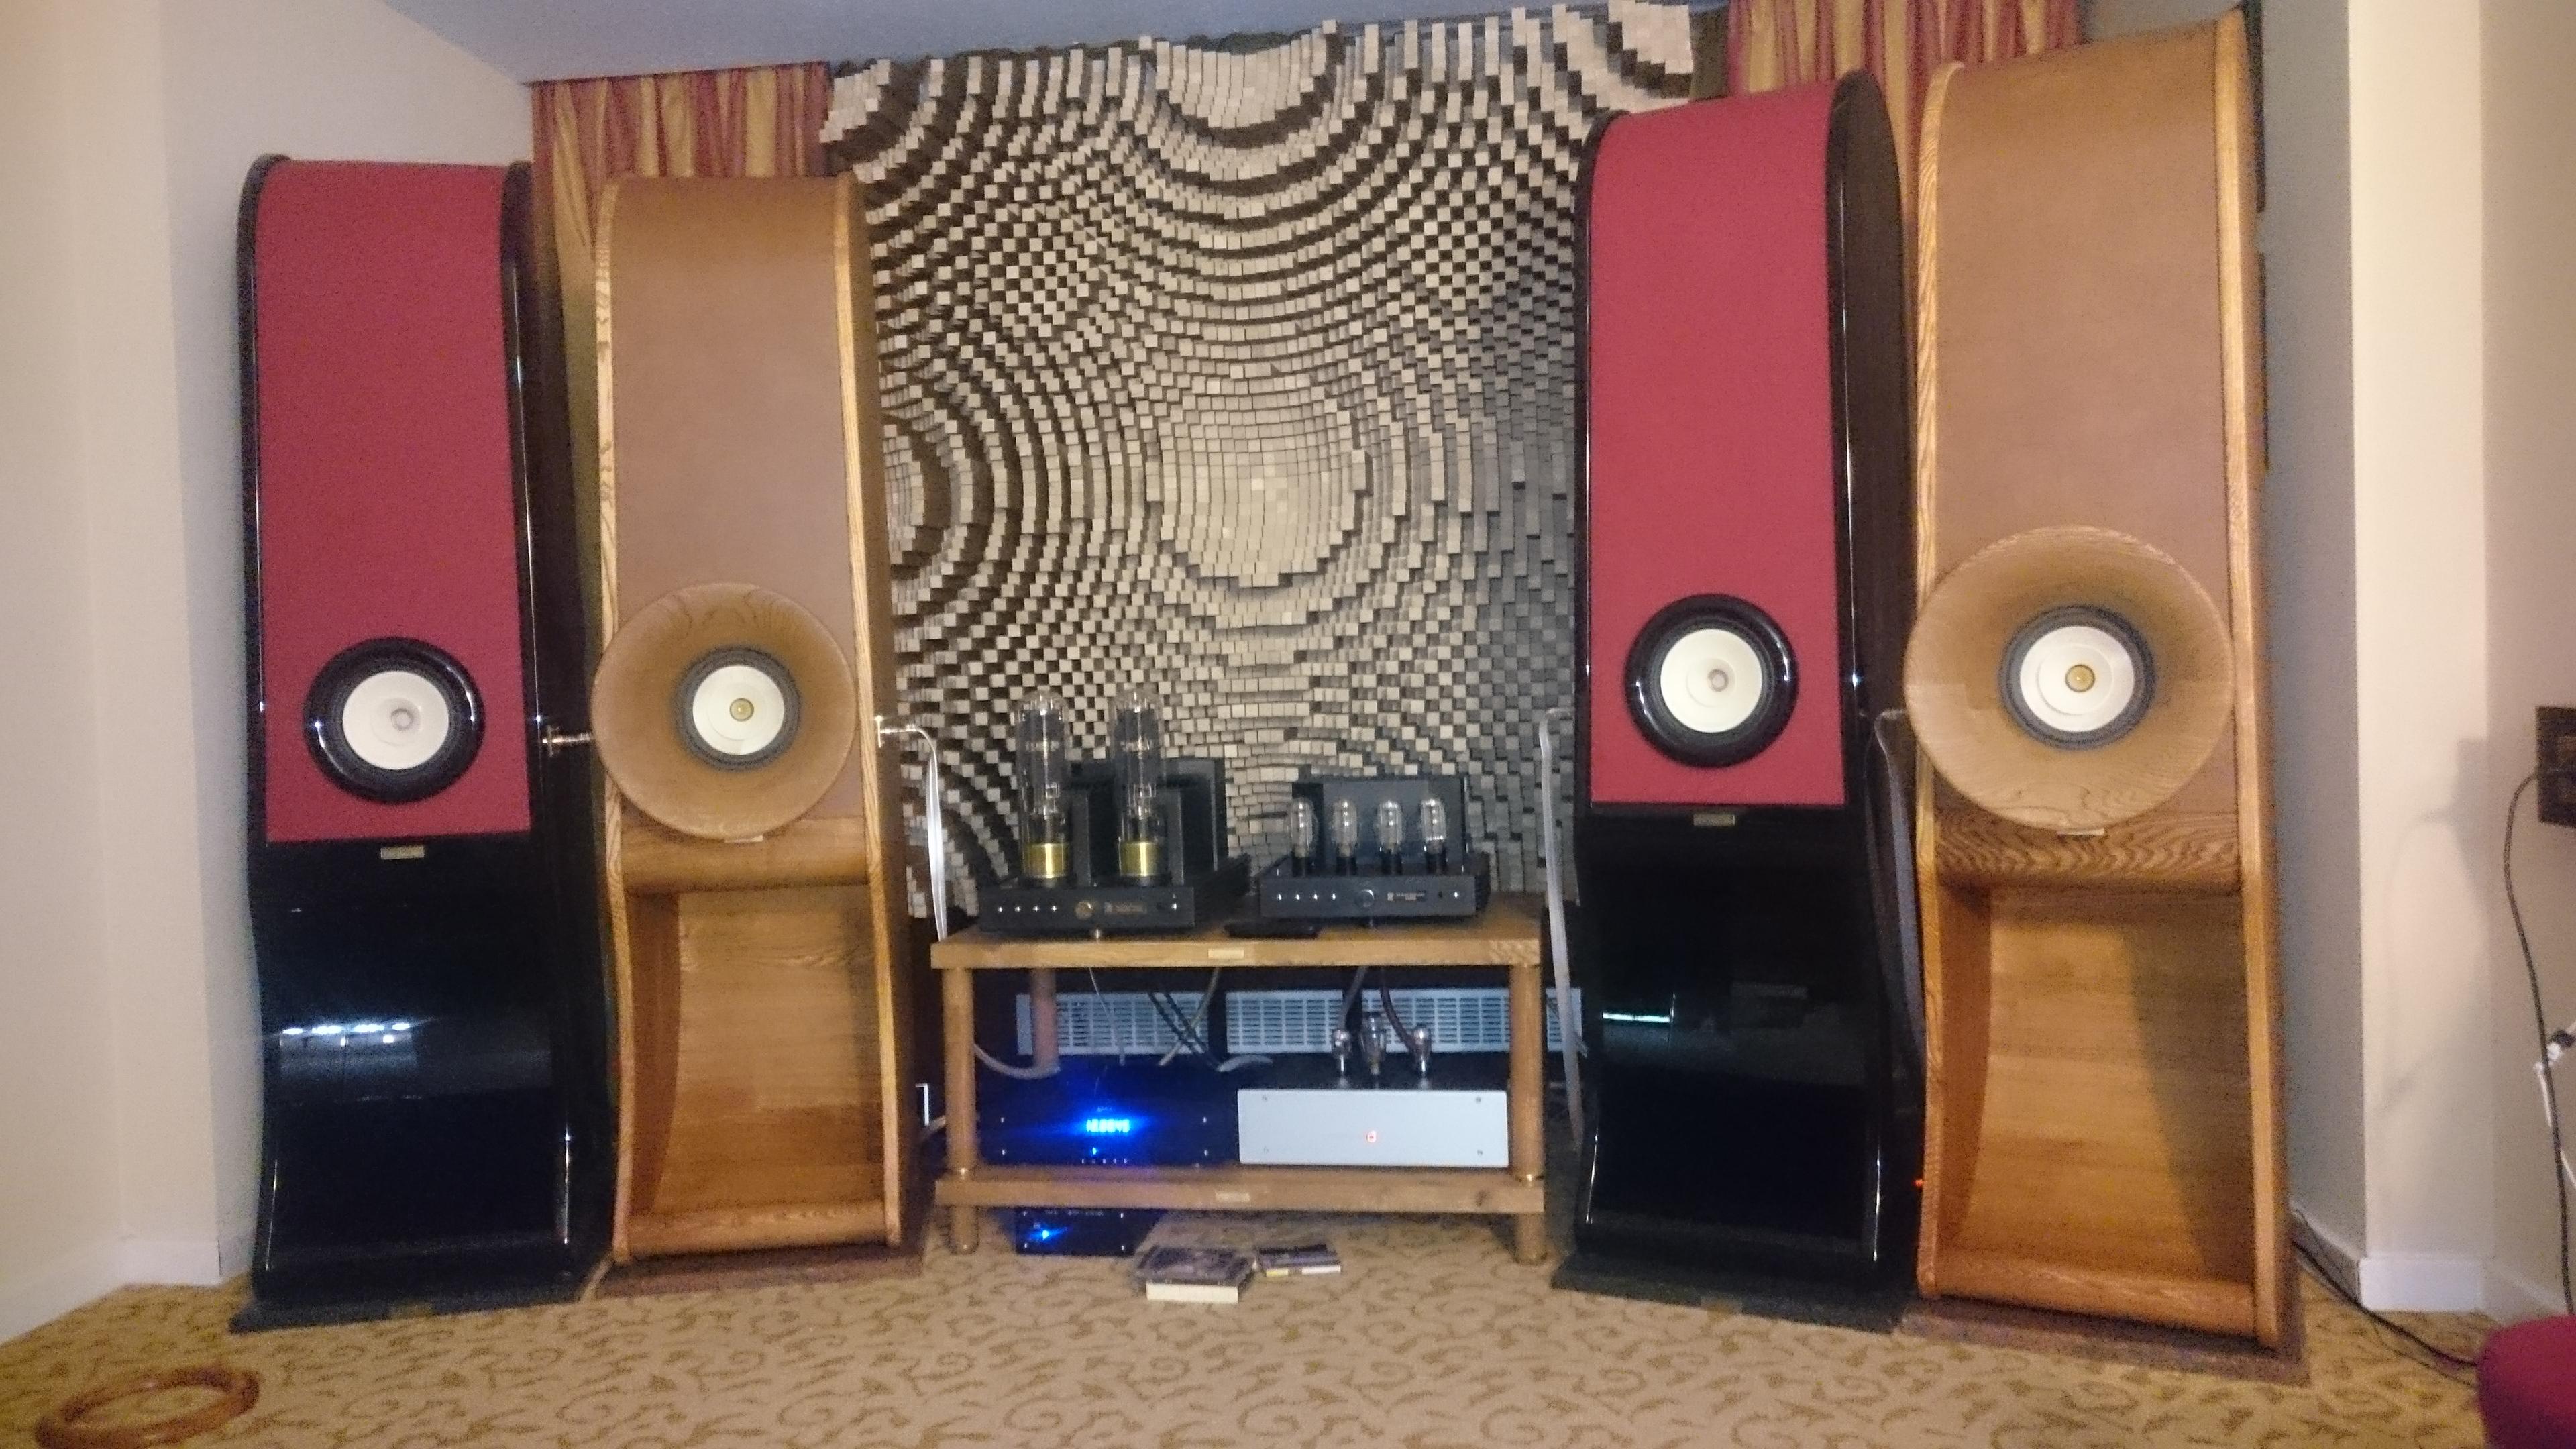 RDacoustic reproduktorové soustavy Evolution stereo 2.0 Budapest 2016 audio show Lampizator KRaudio Kronzilla